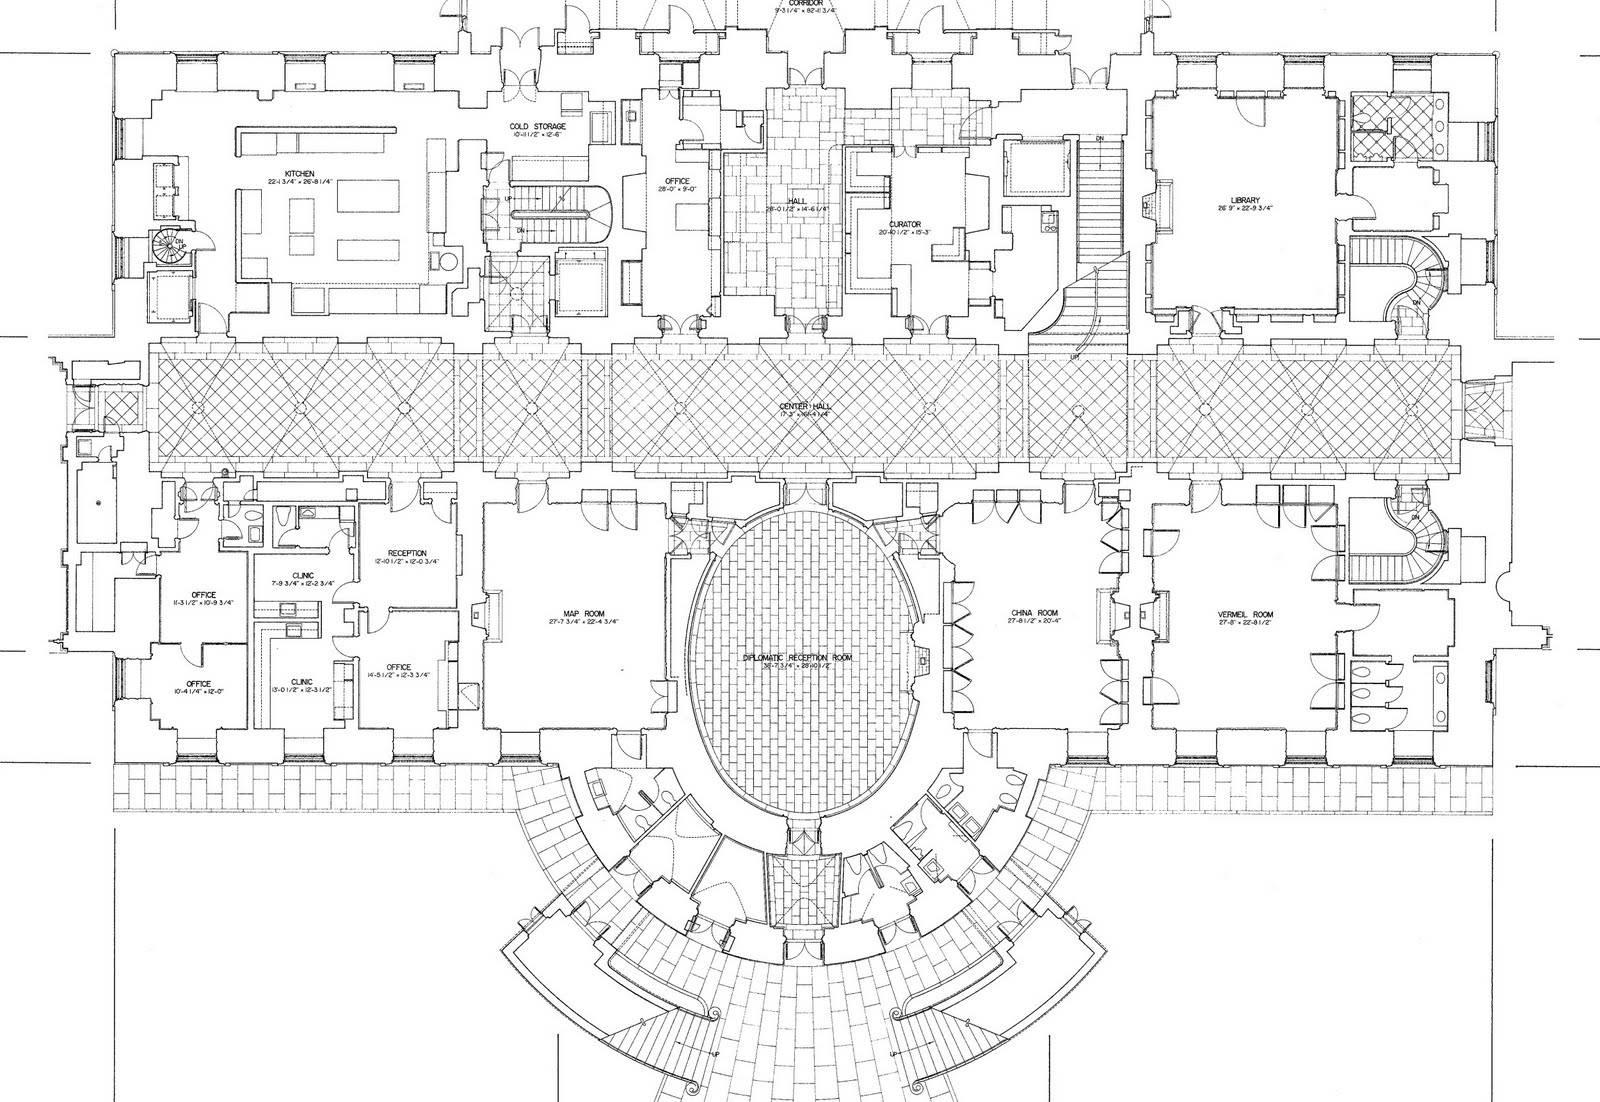 luxury mansion house floor plans luxury inspiration mansion house plans wonderfull design 1000